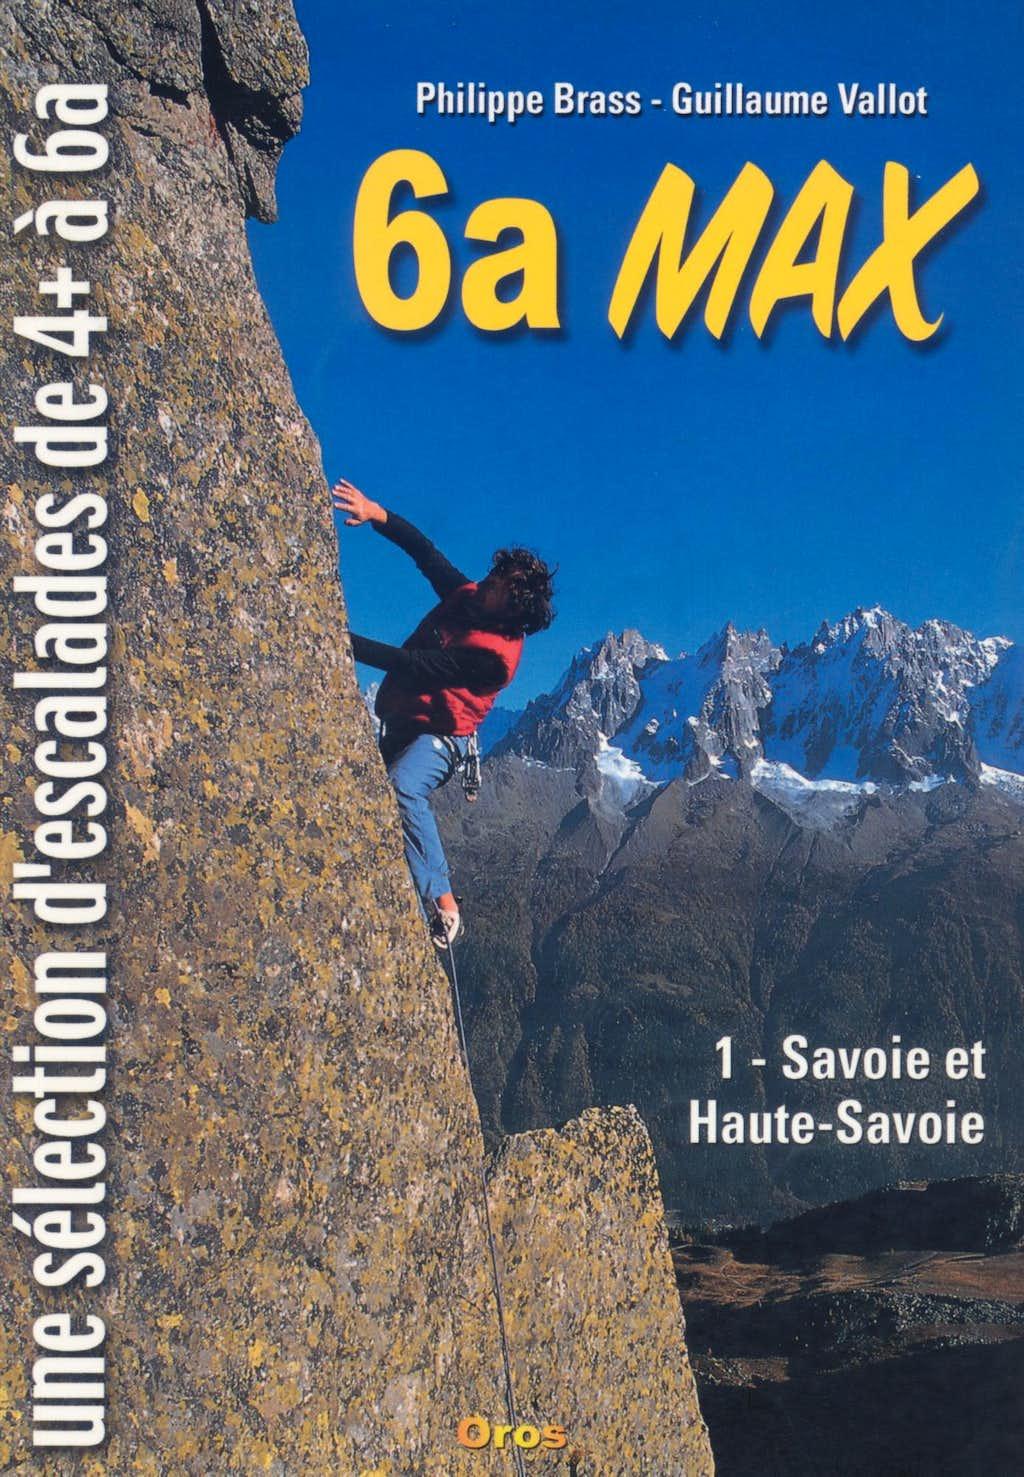 Haute Savoie guidebook